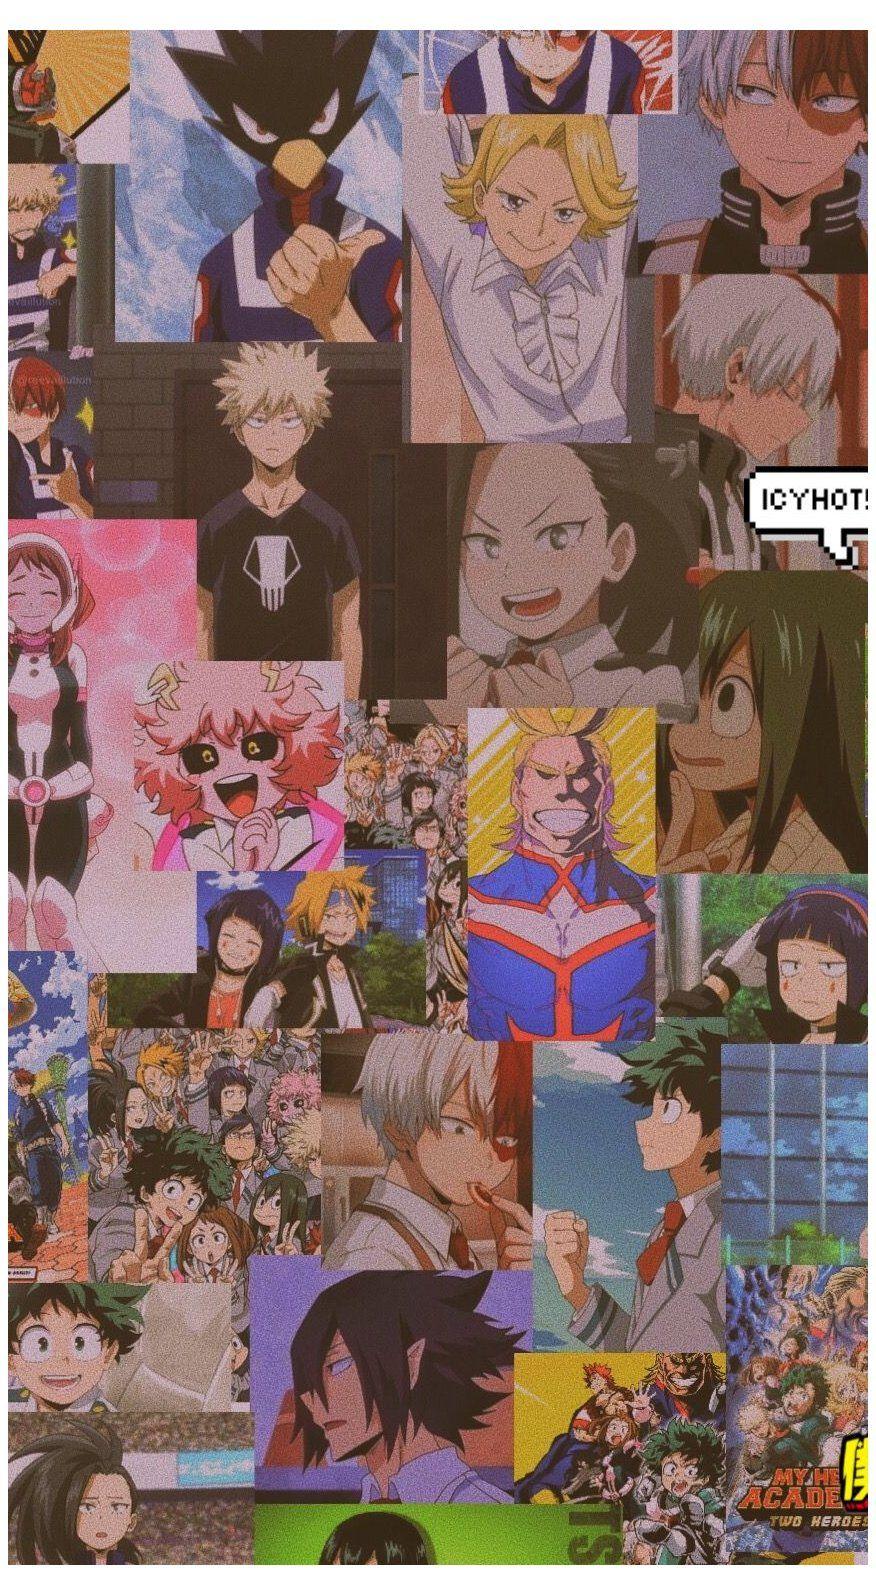 My Hero Academia Aesthetic Wallpaper Anime Aesthetic Wallpaper Iphone Animeaestheticwallpaper In 2021 Anime Wallpaper Iphone Anime Wallpaper Anime Wallpaper Phone